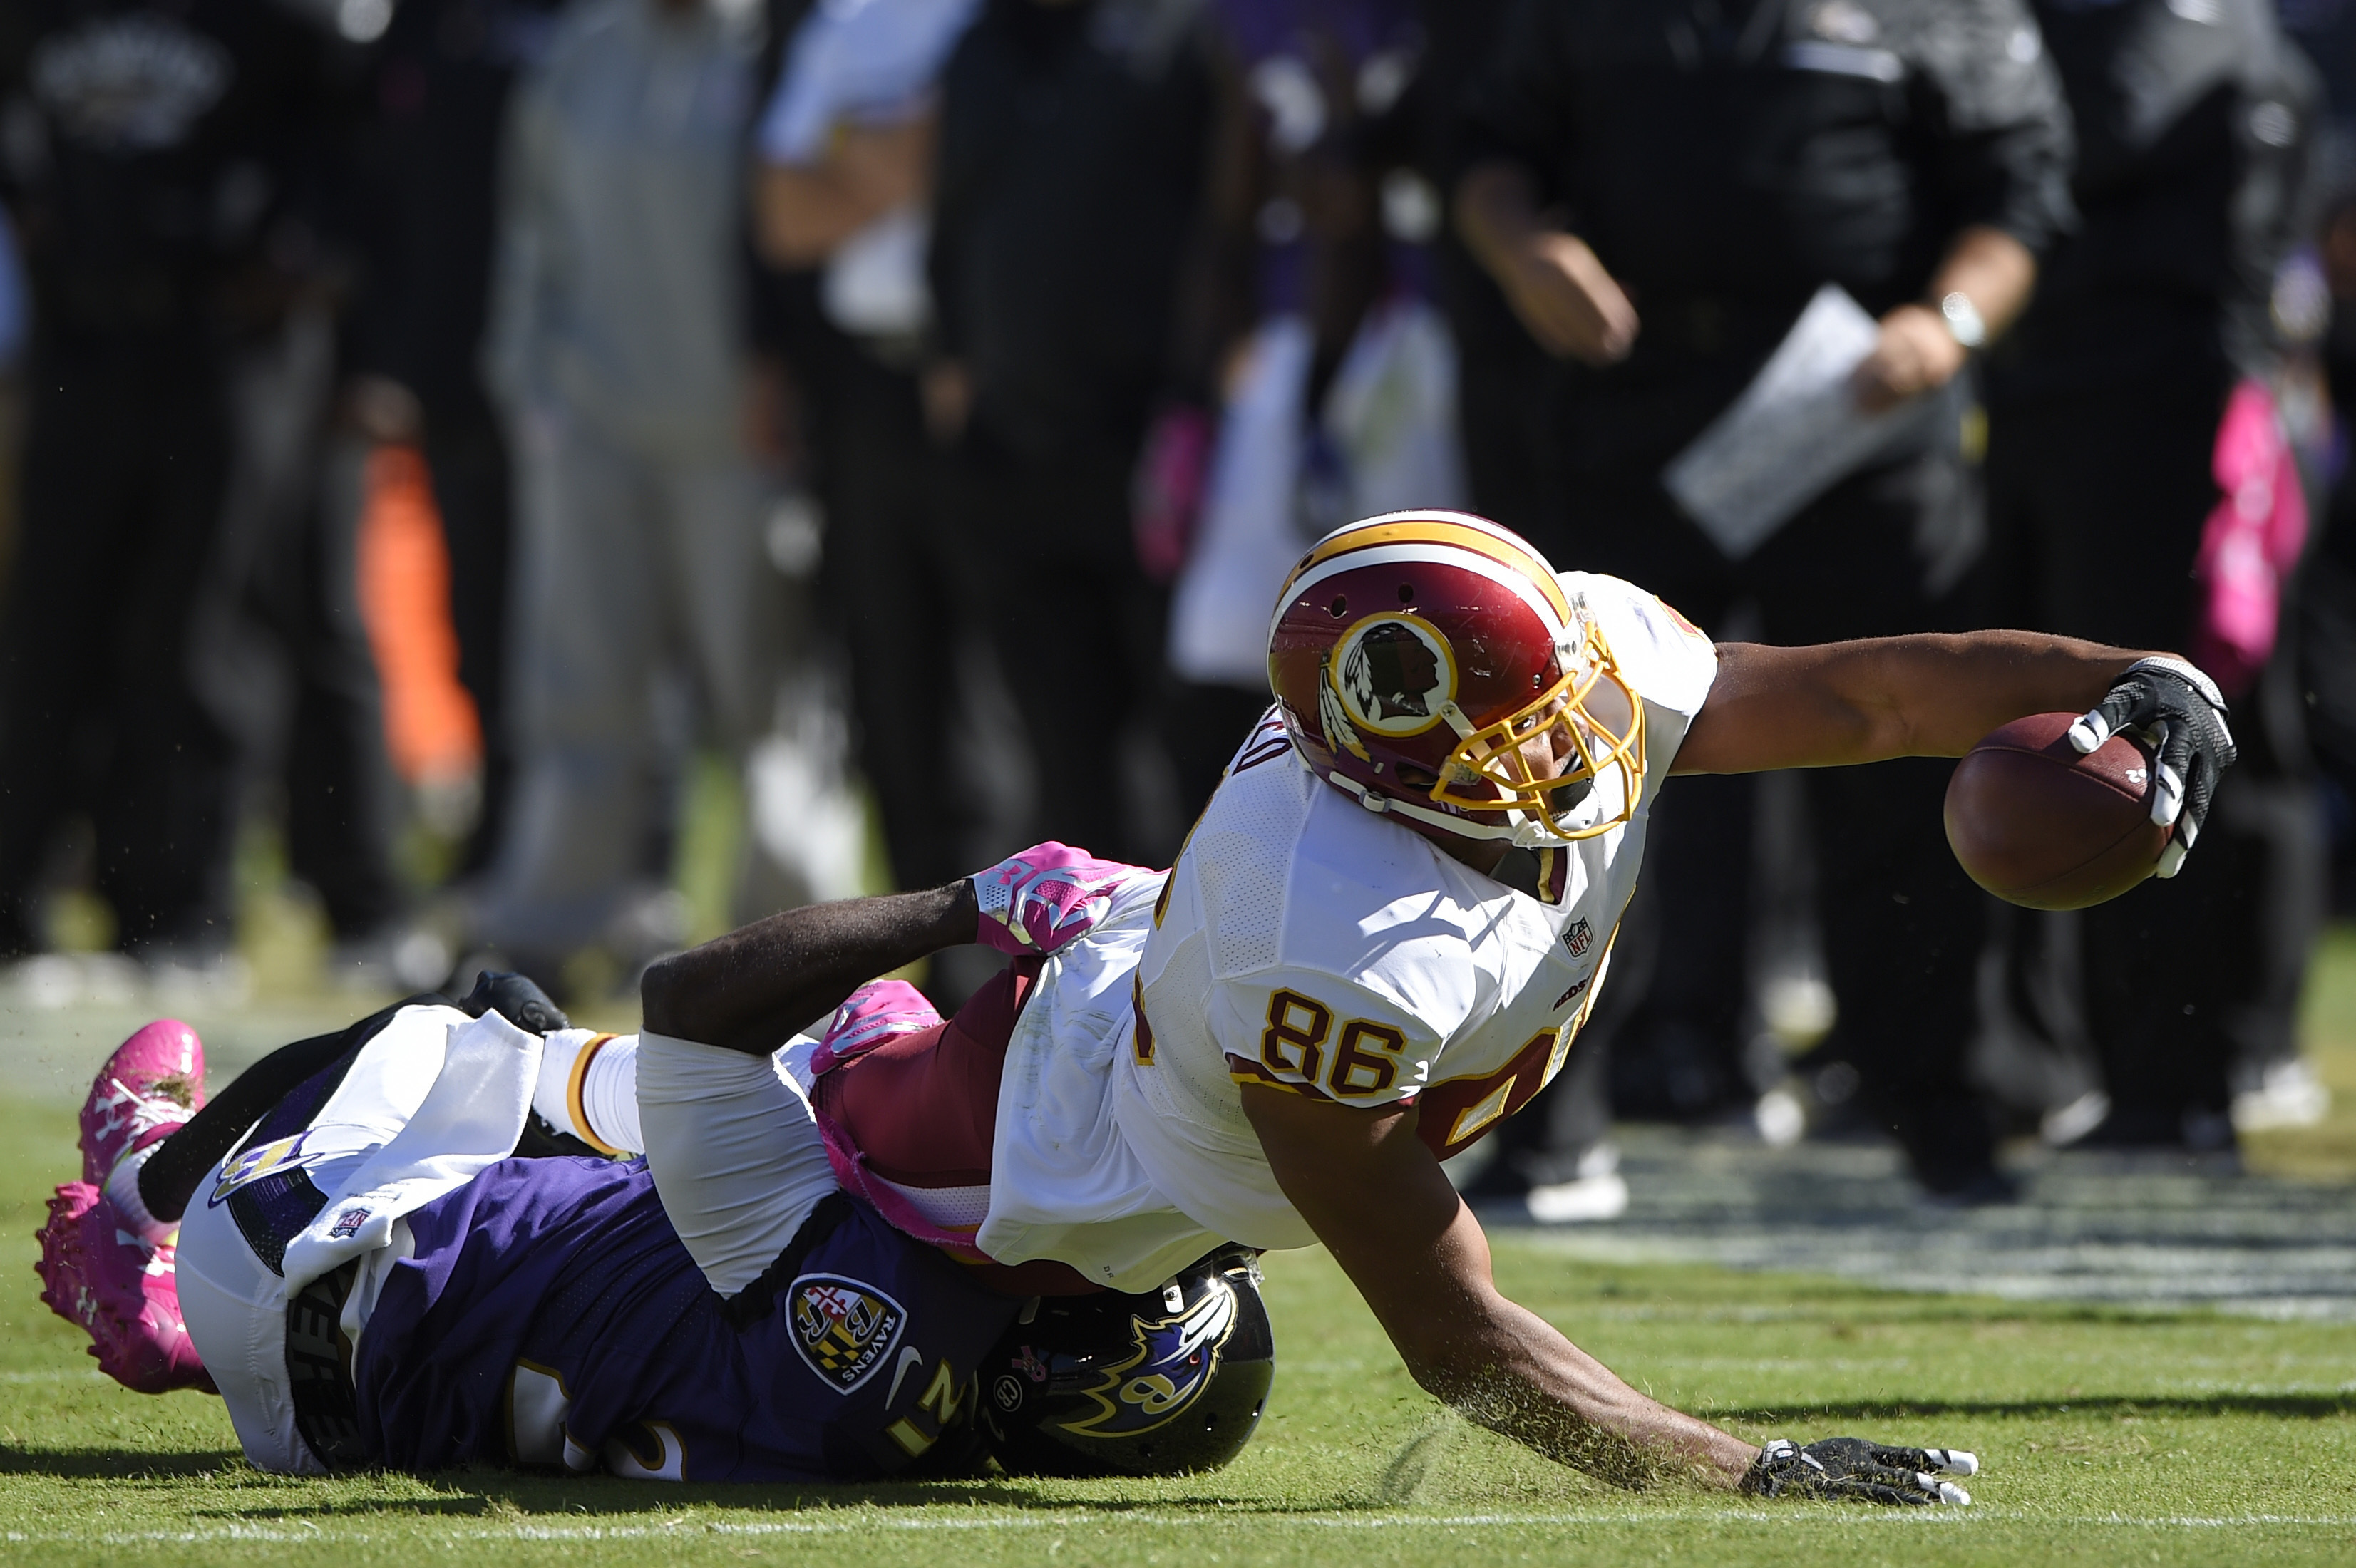 Washington Redskins' Jordan Reed (86) reaches for extra yardage as Baltimore Ravens' Lardarius Webb (21) tackles him during the first half of an NFL football game, Sunday, Oct. 9, 2016, in Baltimore. (AP Photo/Nick Wass)